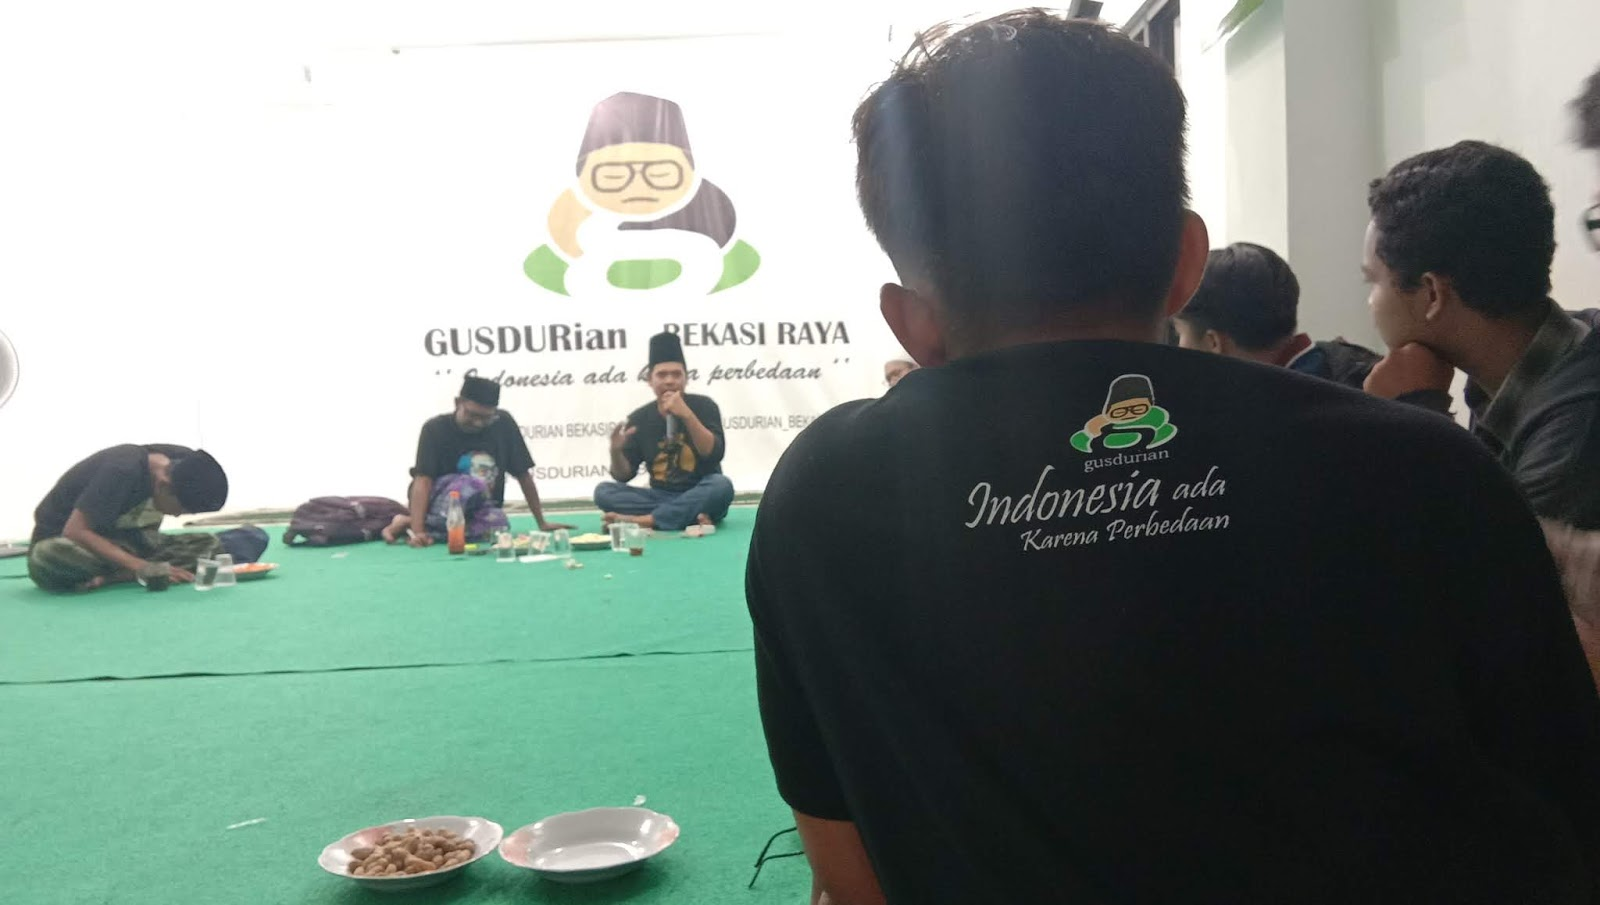 Sebuah Catatan: Kongkow Bareng Gusdurian Bekasi Raya